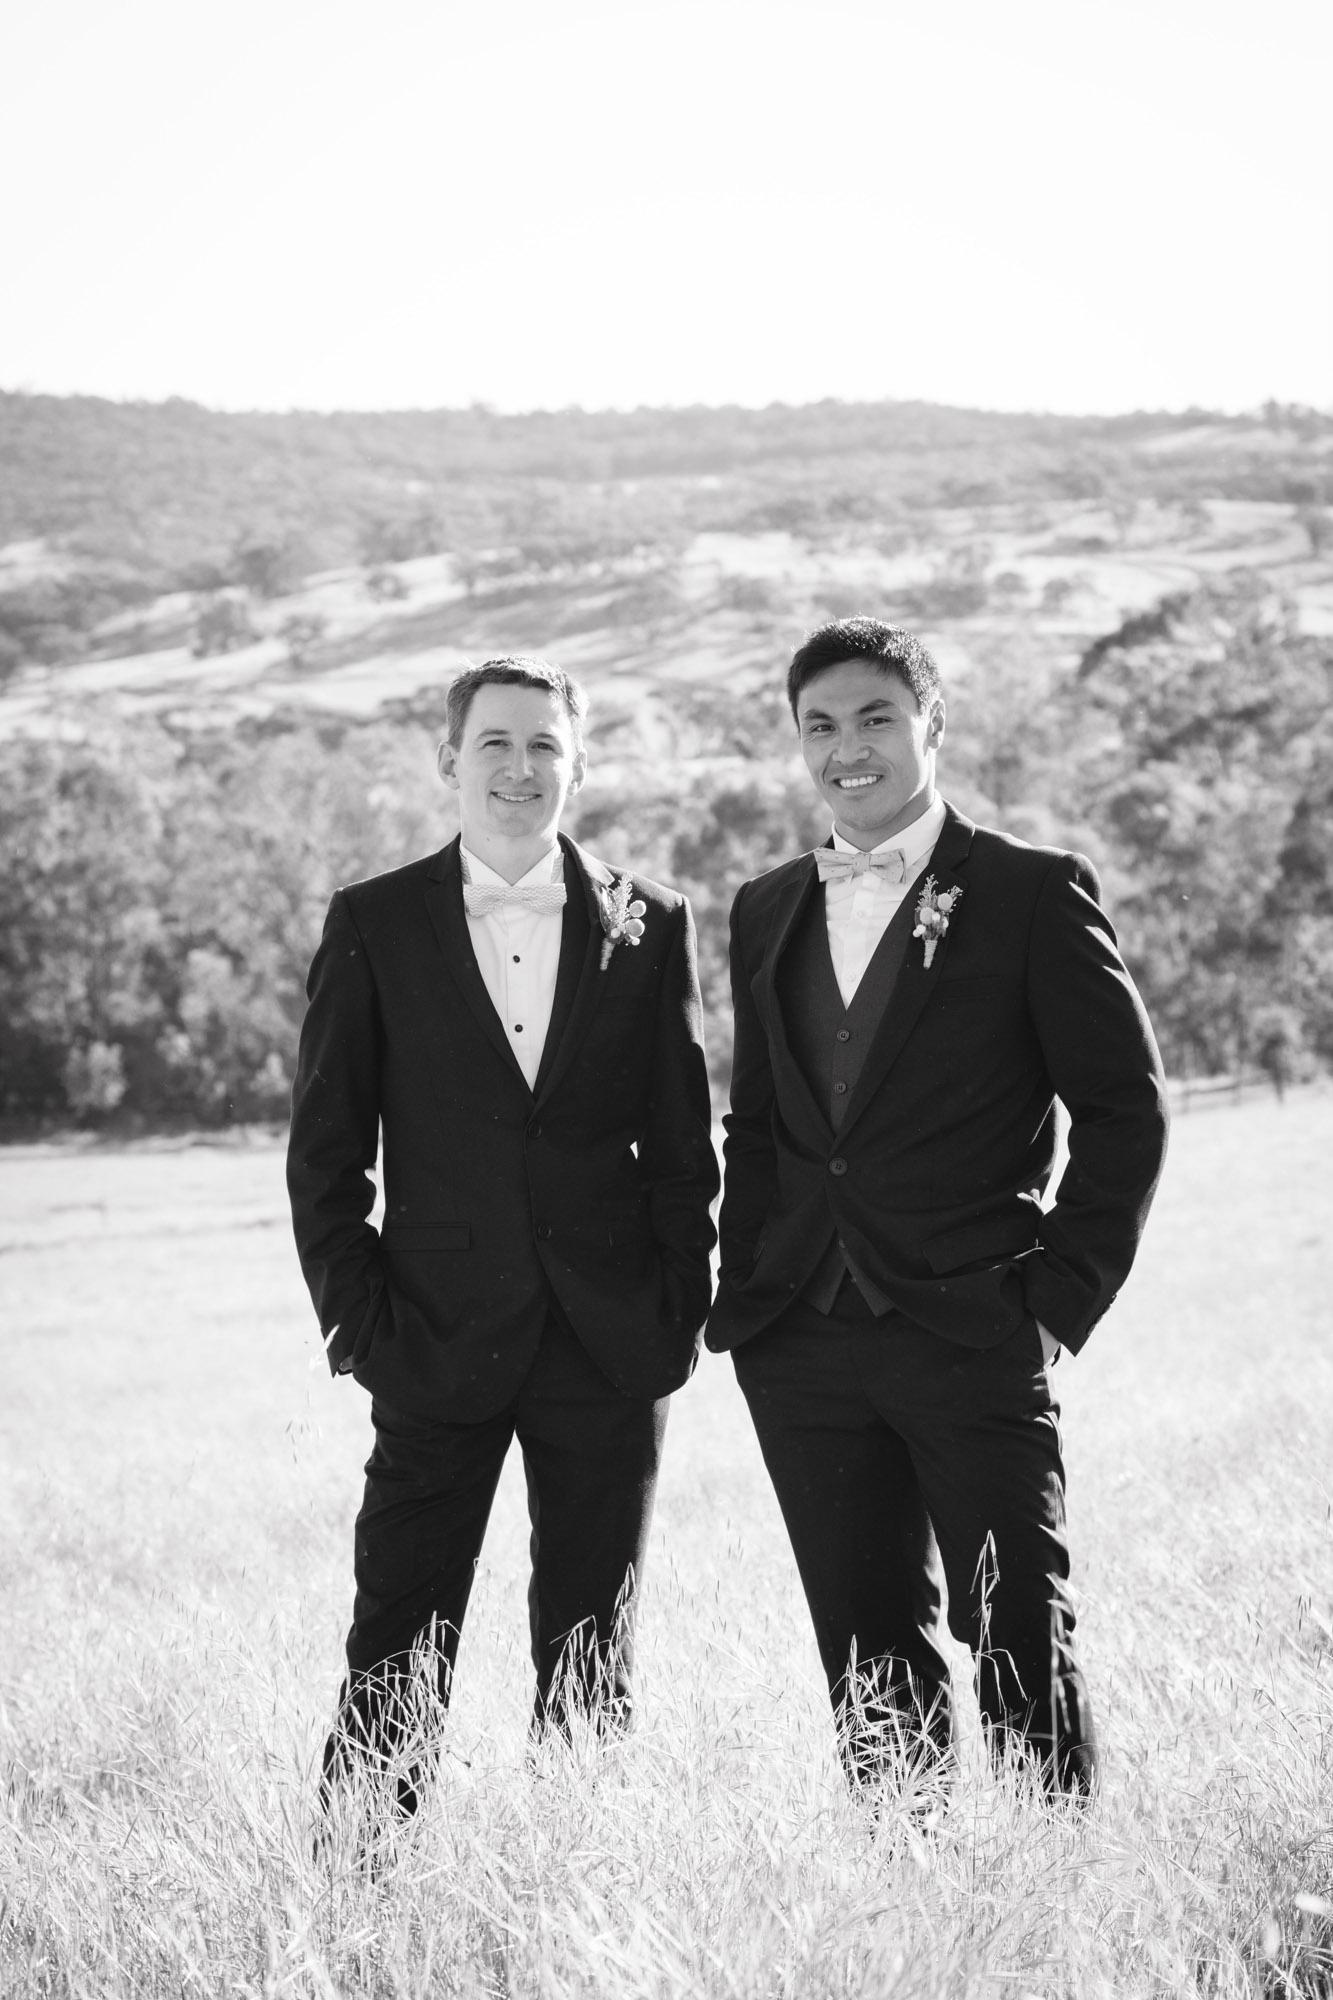 Angie-Roe-Photography-Wedding-Perth-Northam-Wheatbelt-Country-Rural (54).jpg